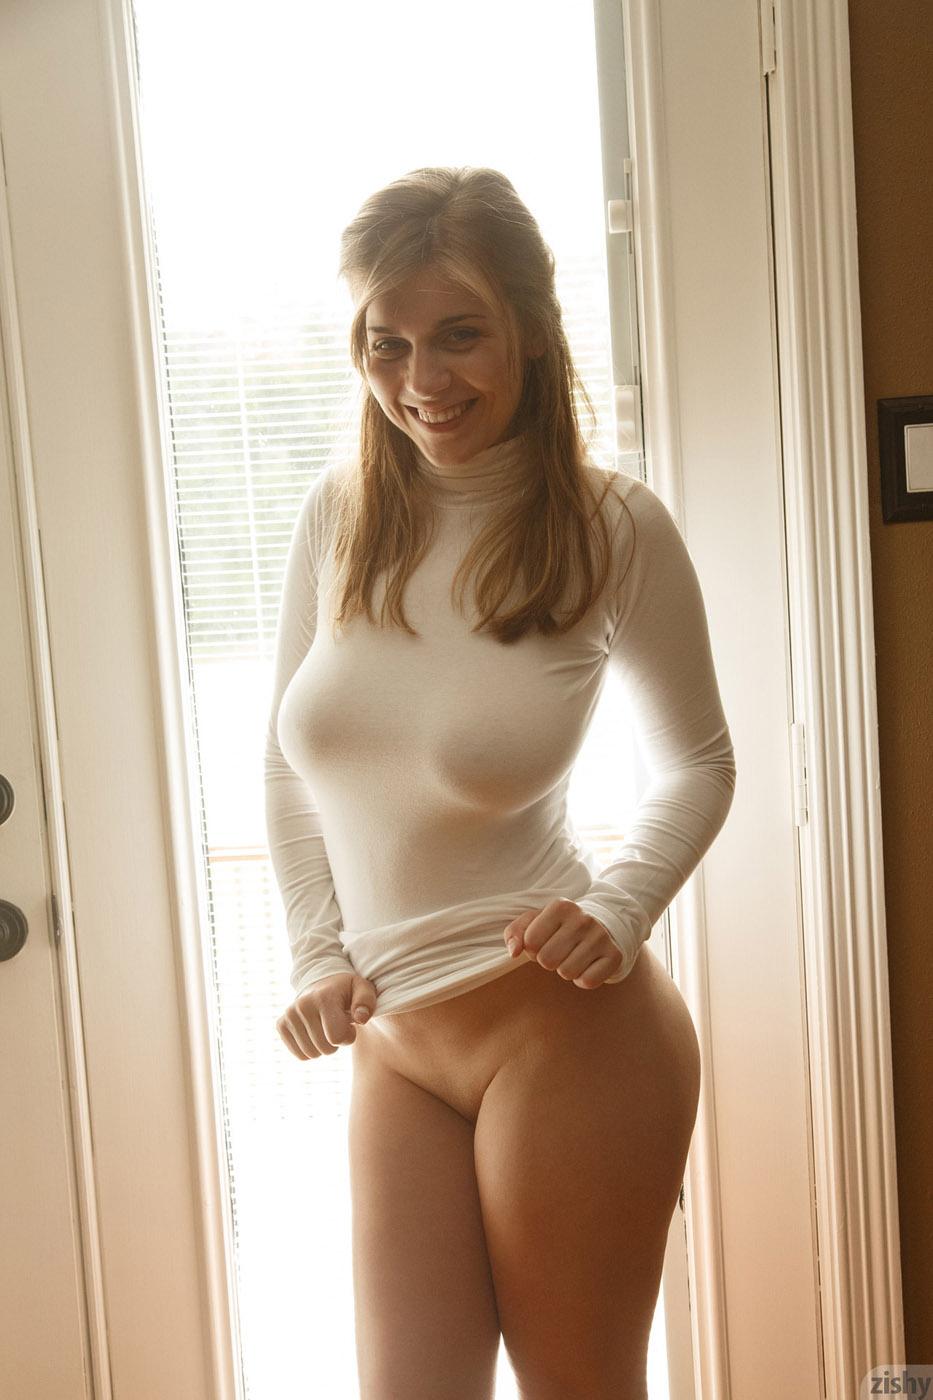 Austin white nude pics